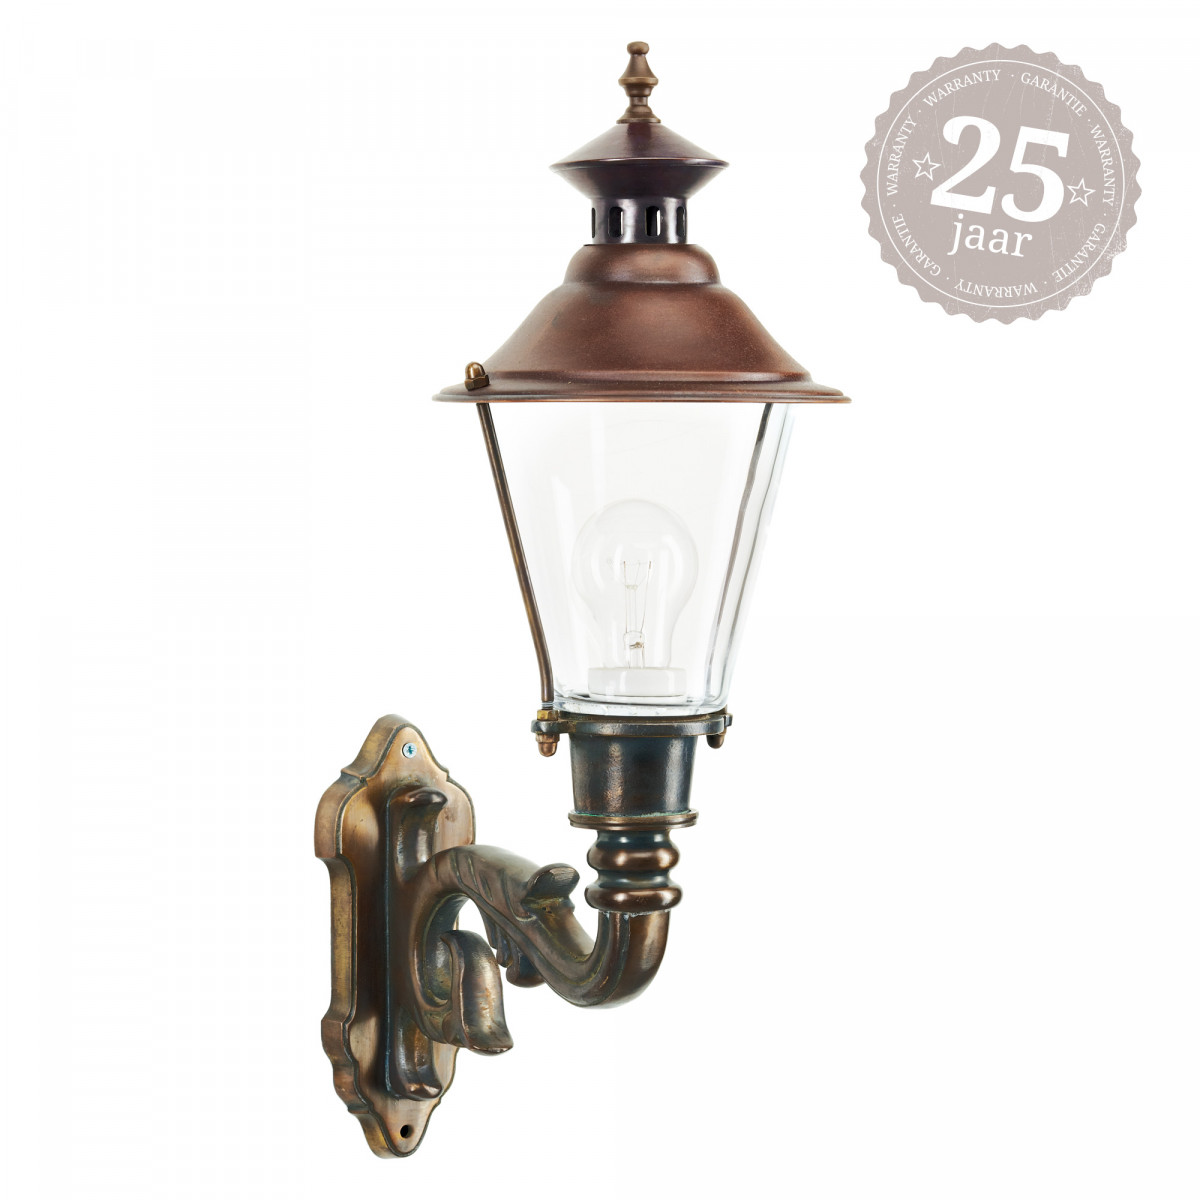 Muurlamp Ouddorp